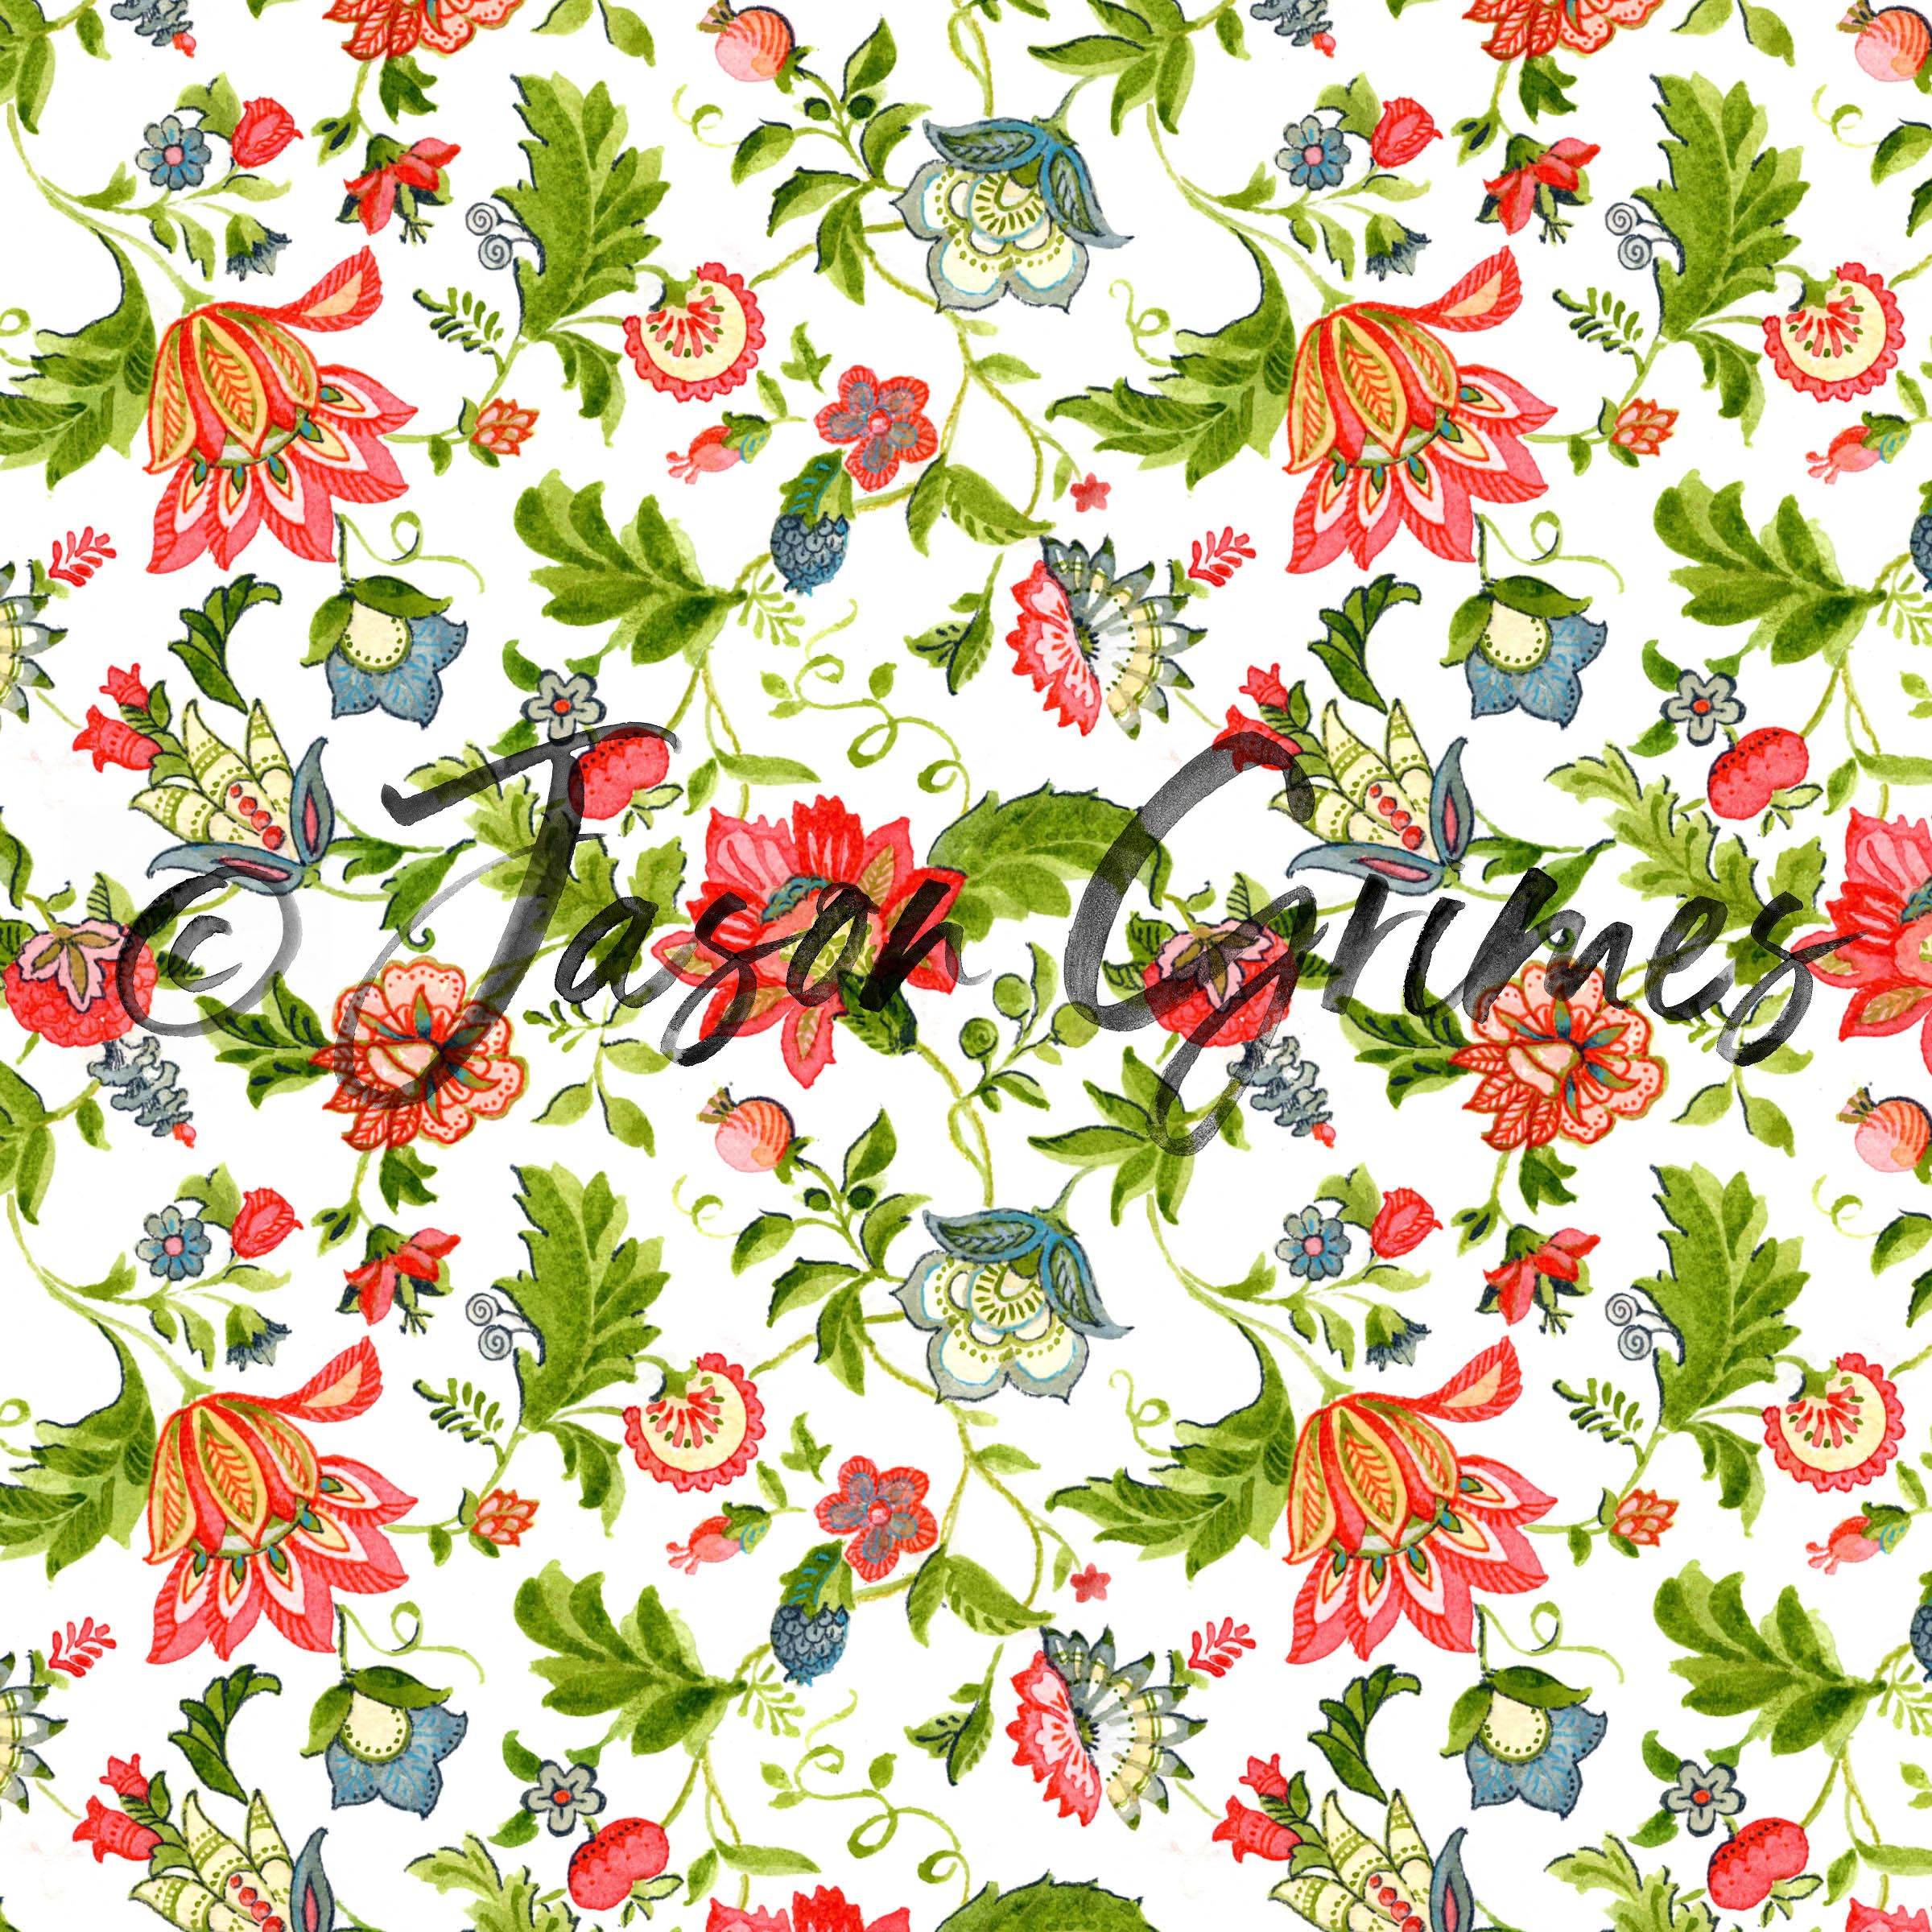 Jacobean Floral - Full Color